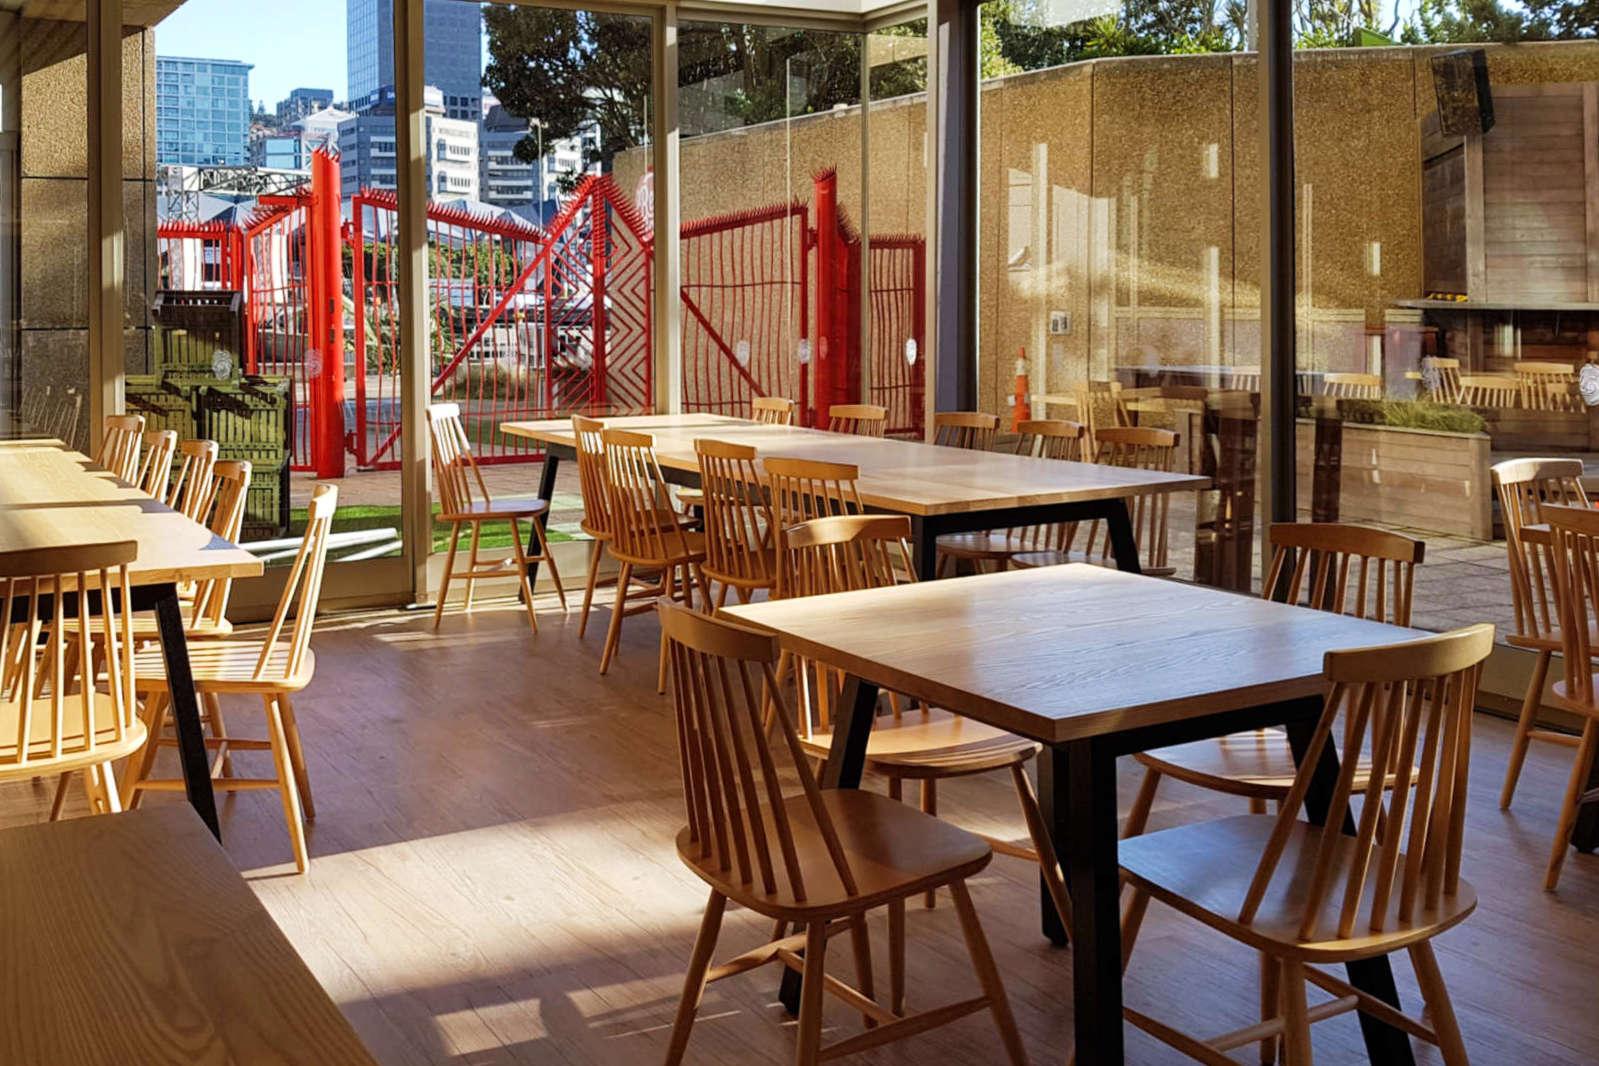 Te Papa Cafe - interior seating view to red gates